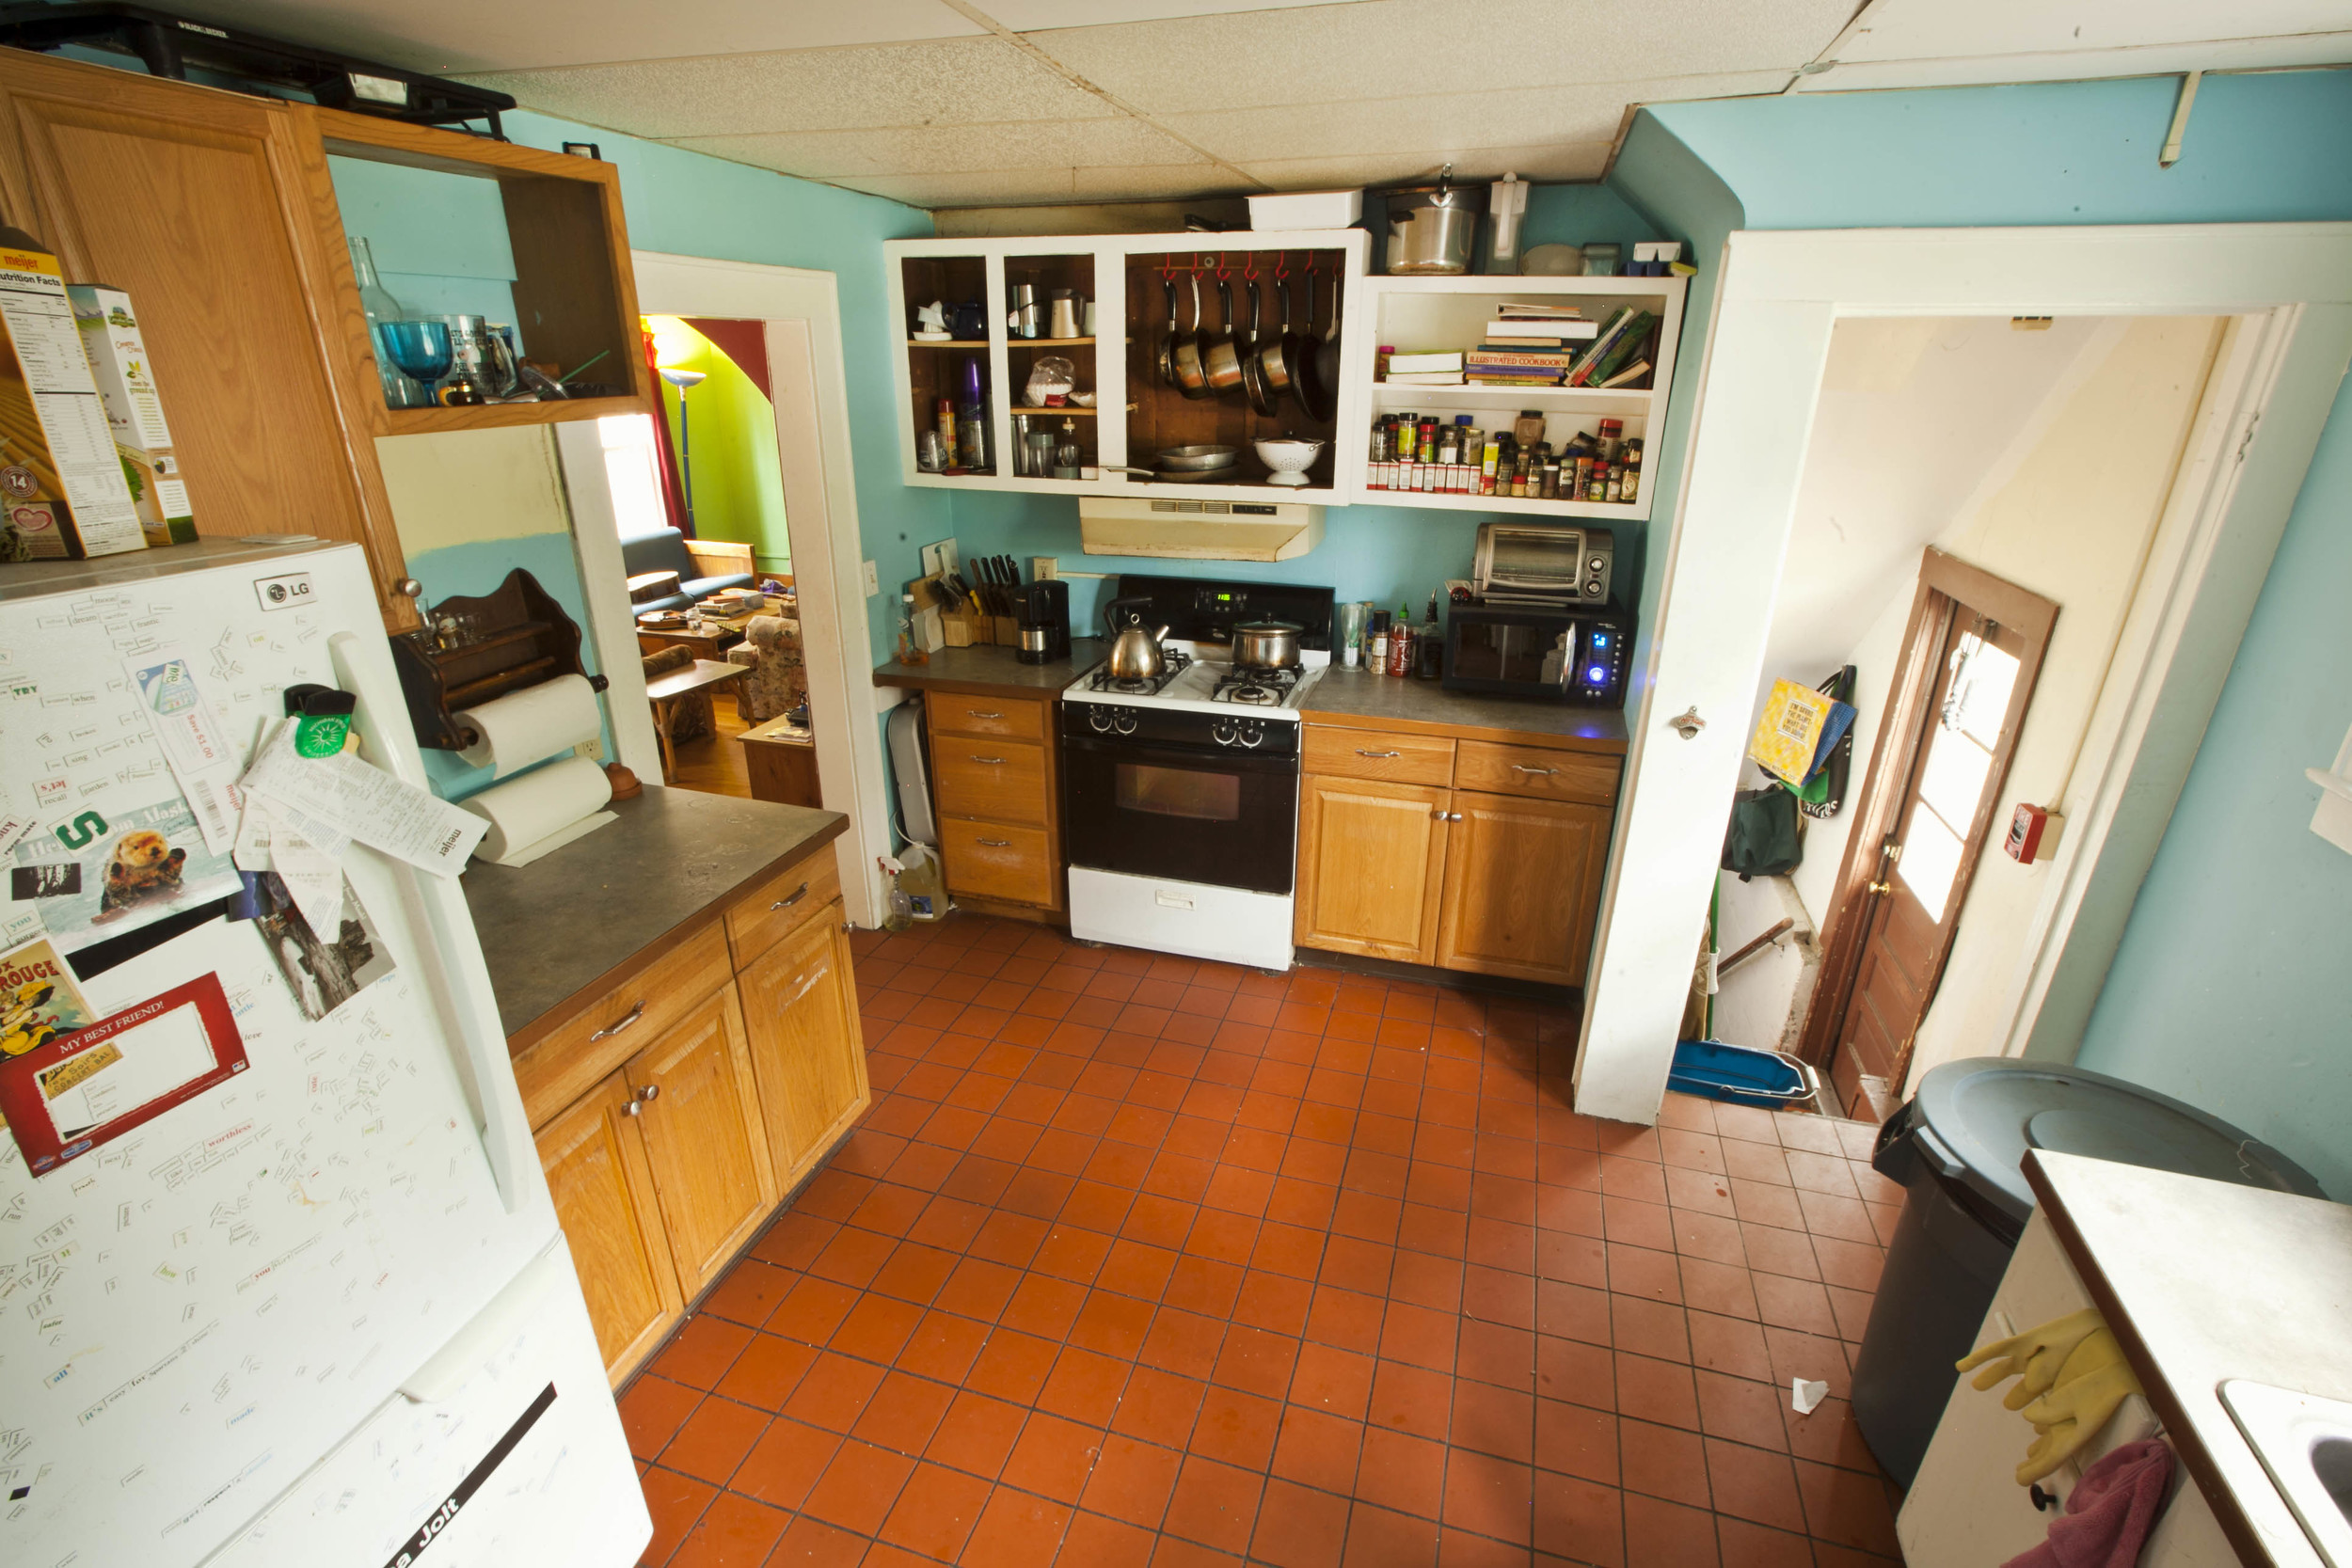 Ferency_Kitchen2.jpg